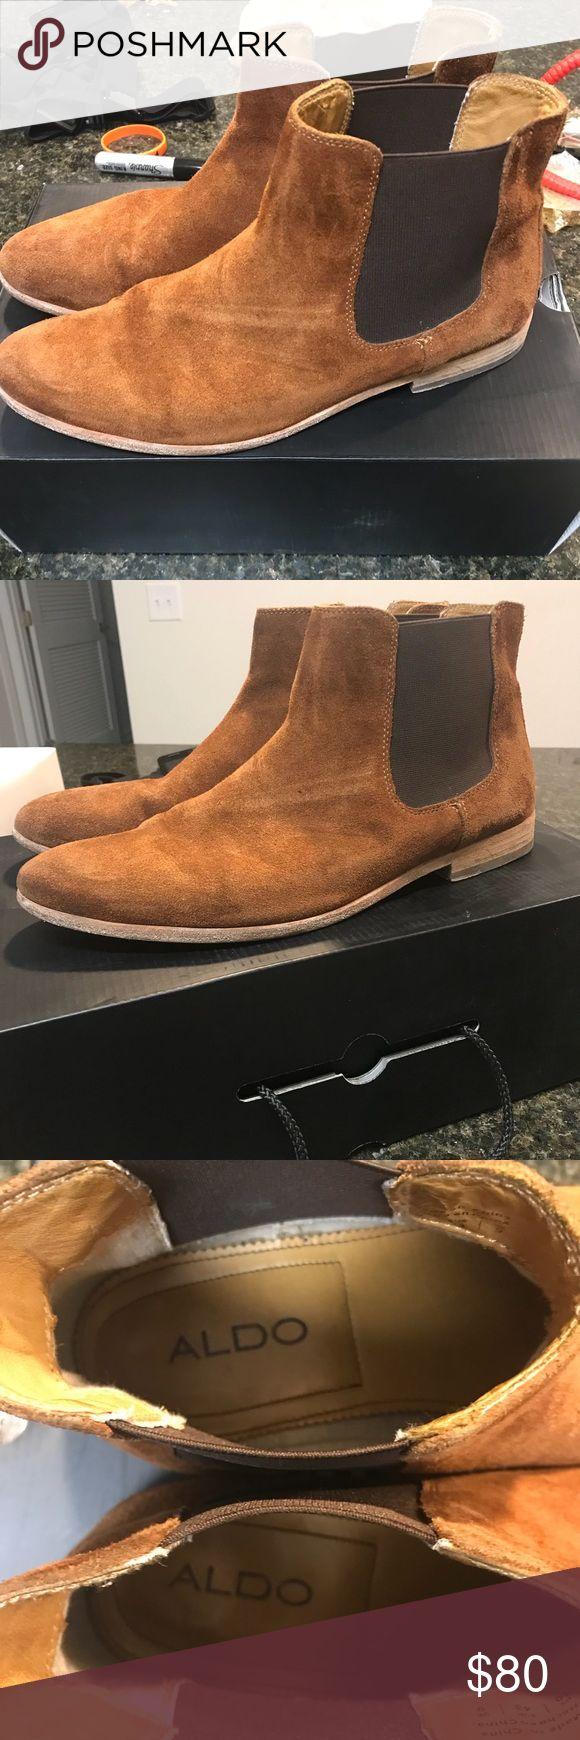 Aldo Jerenalia Chelsea Boots Mens Size 10 Aldo Jerenalia Chelsea Boots Mens Size 10 100% authentic. Good condition Aldo Shoes Boots